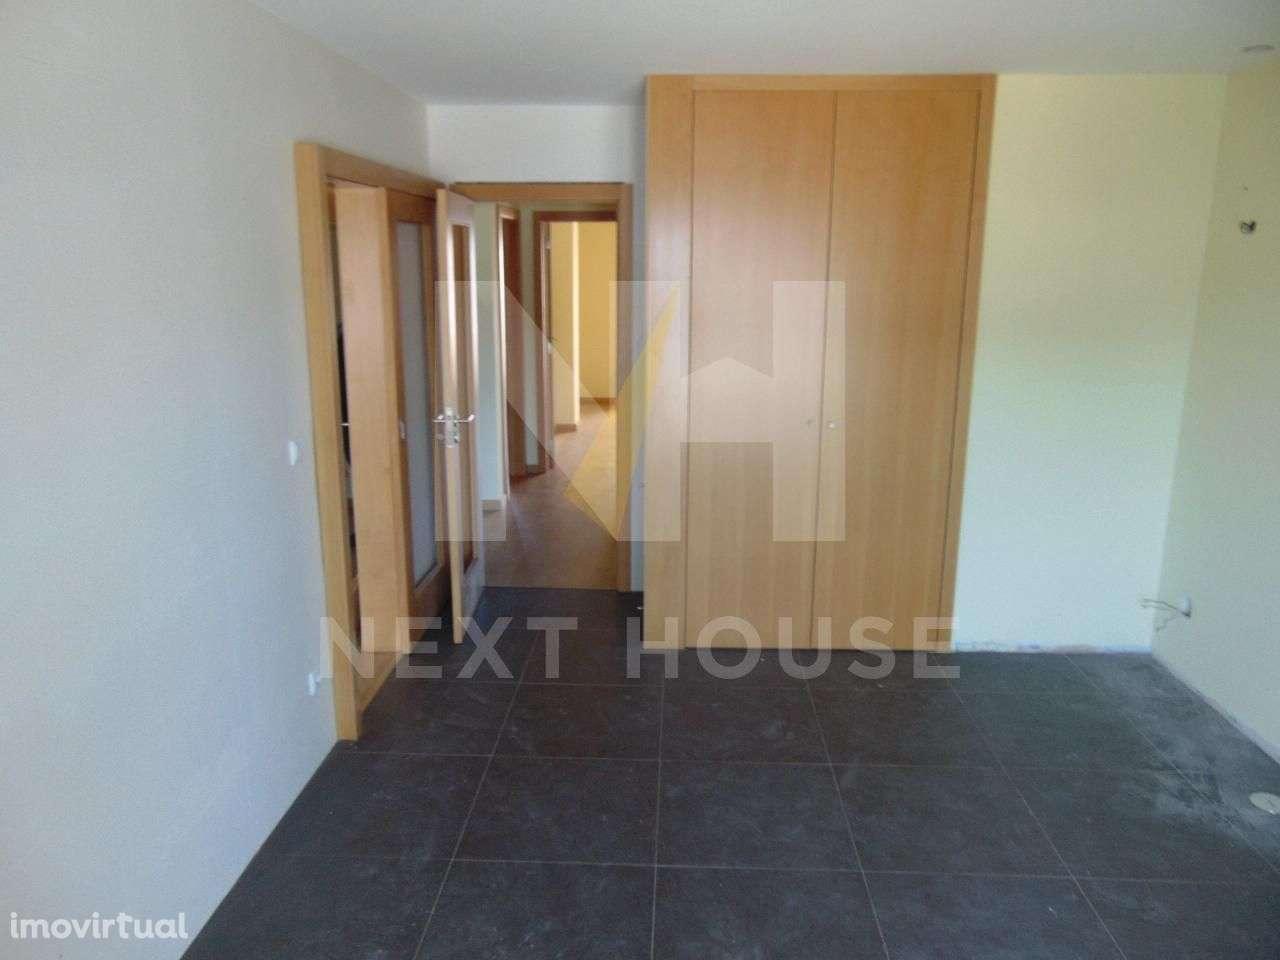 Apartamento para comprar, Gafanha da Boa Hora, Aveiro - Foto 5